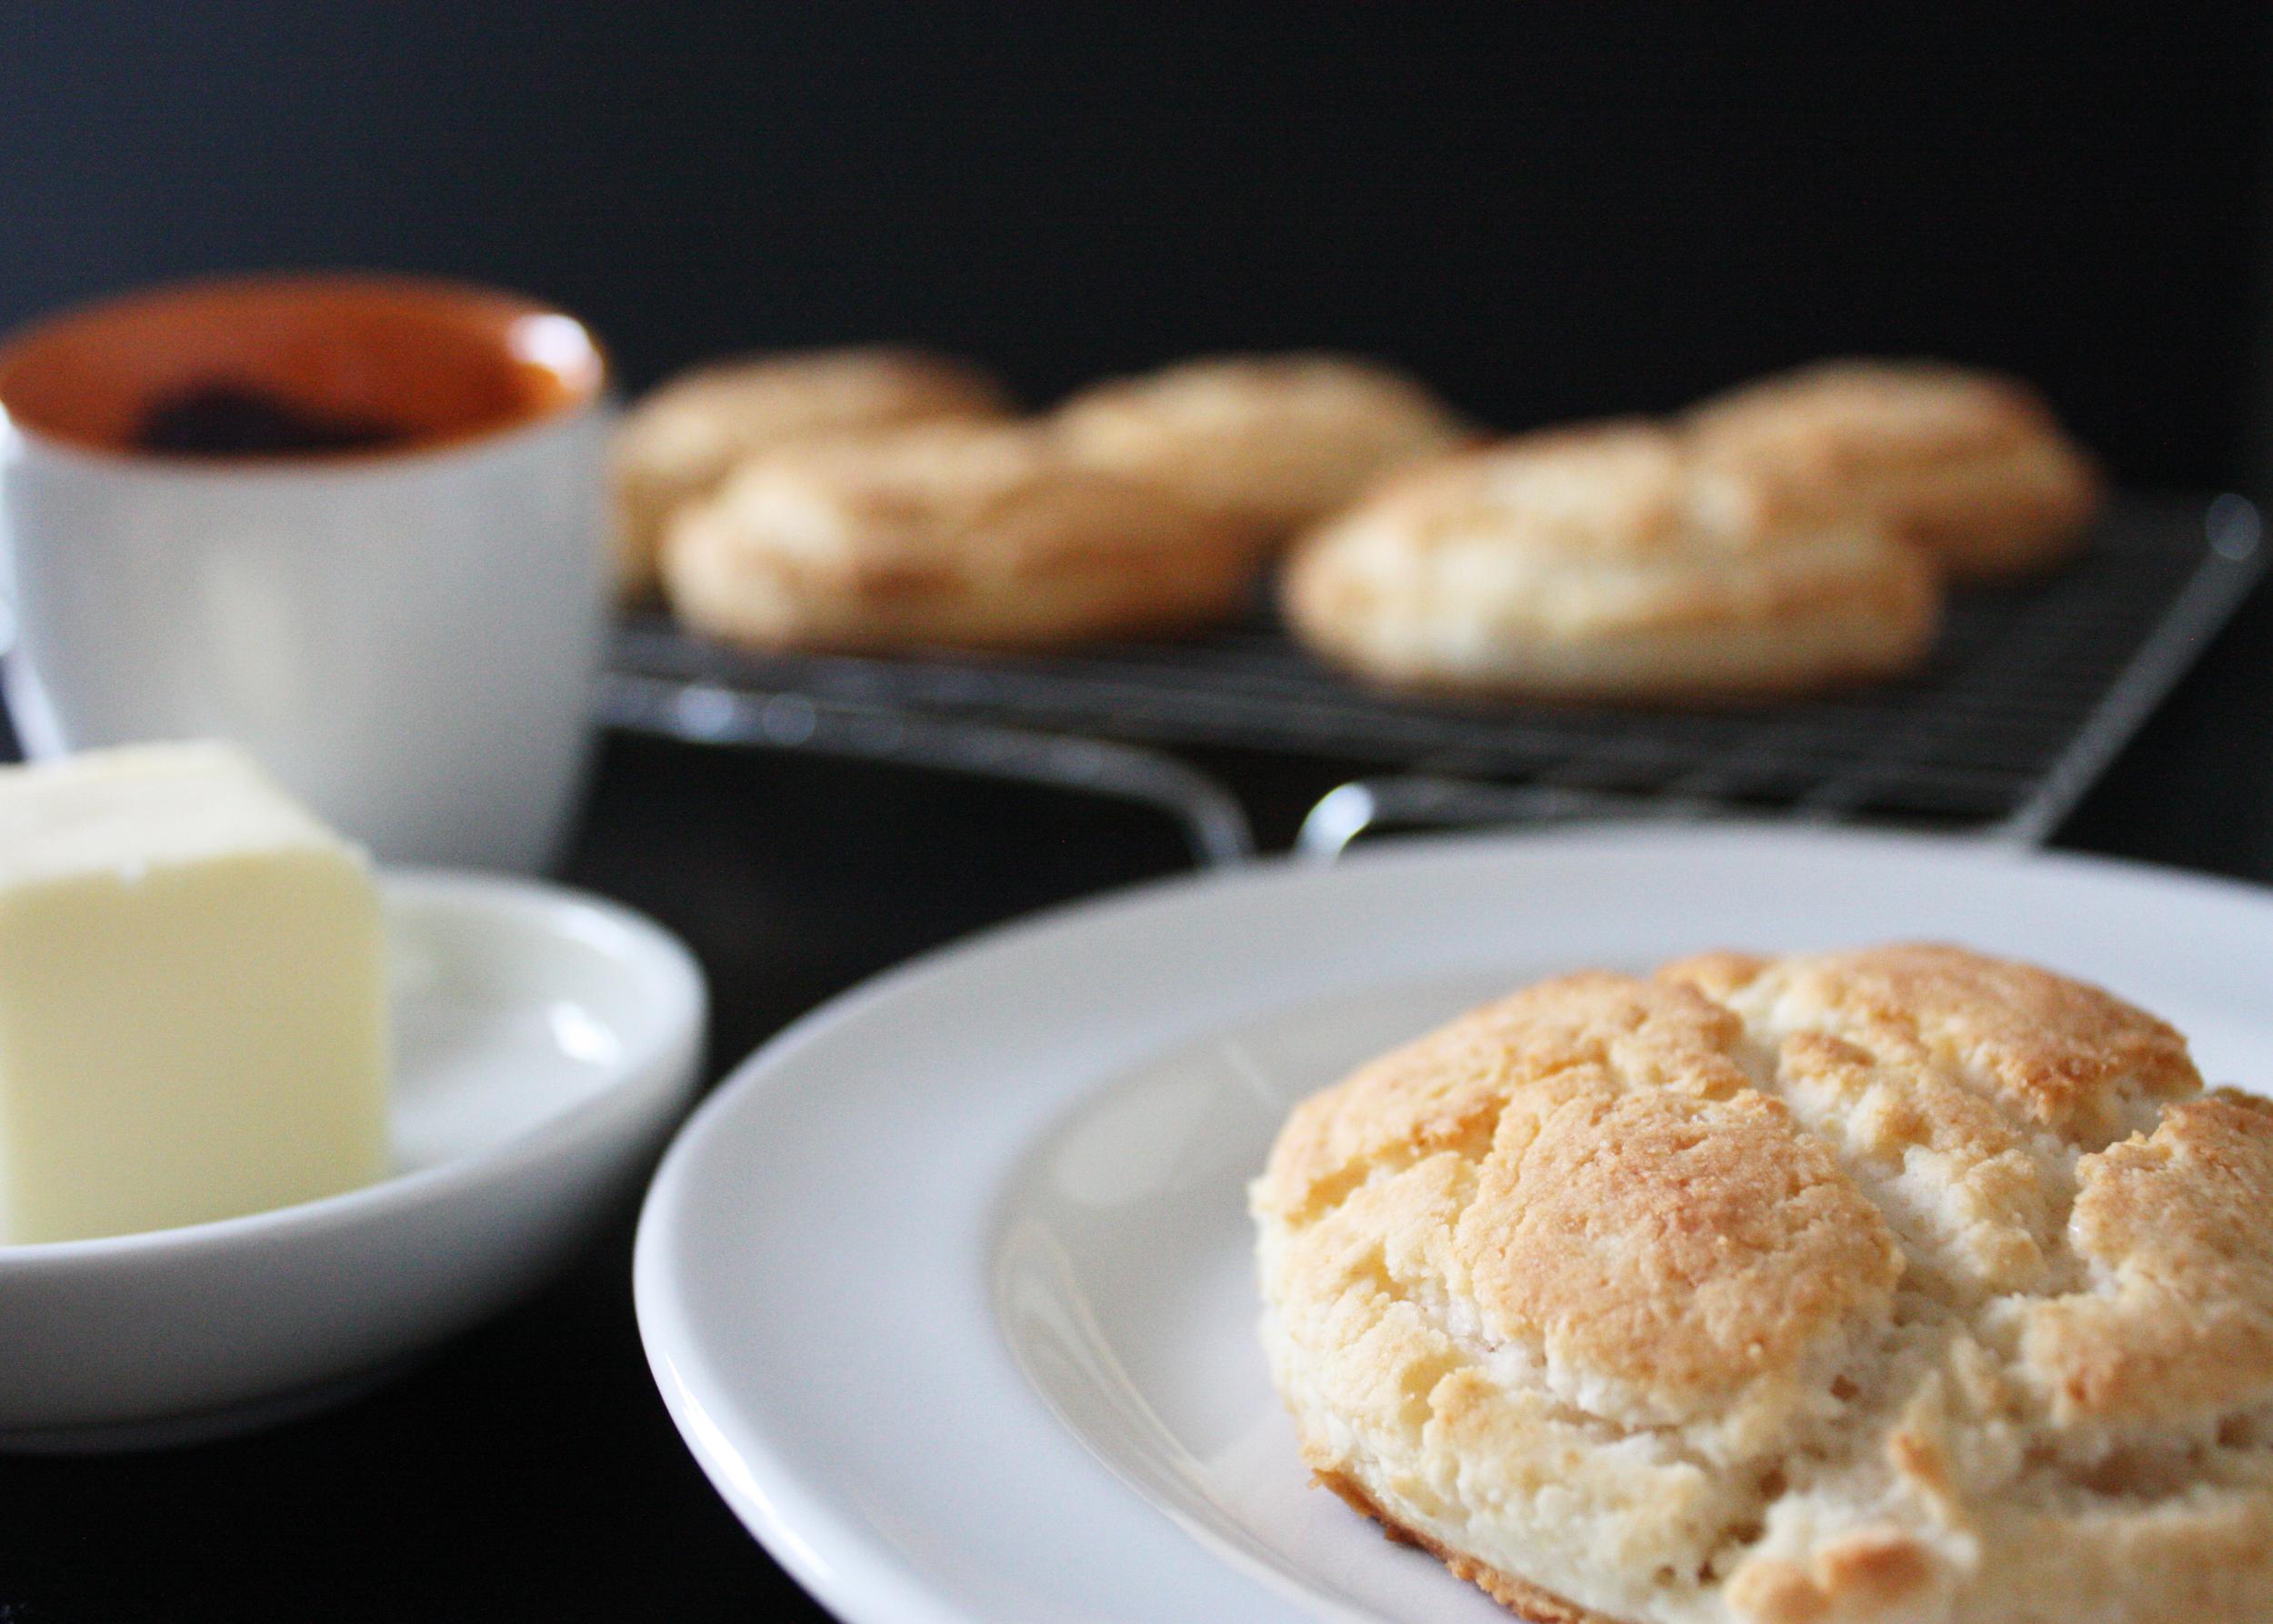 sam-c-perry-gluten-free-biscuits-main.jpg